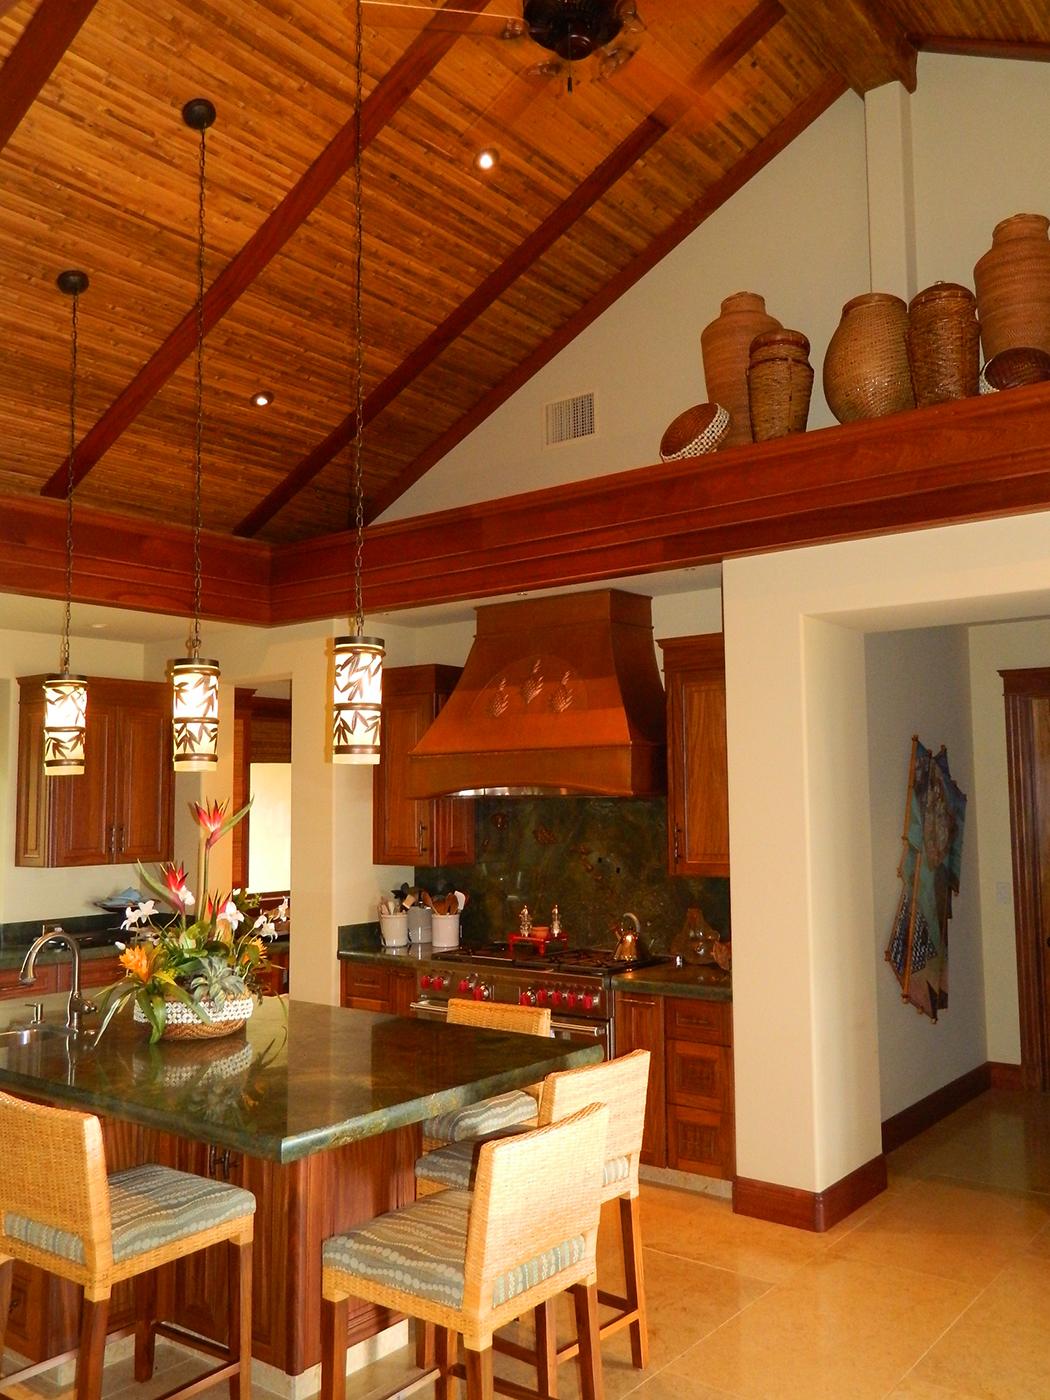 14 MAUI Residence - kitchen range hood.JPG